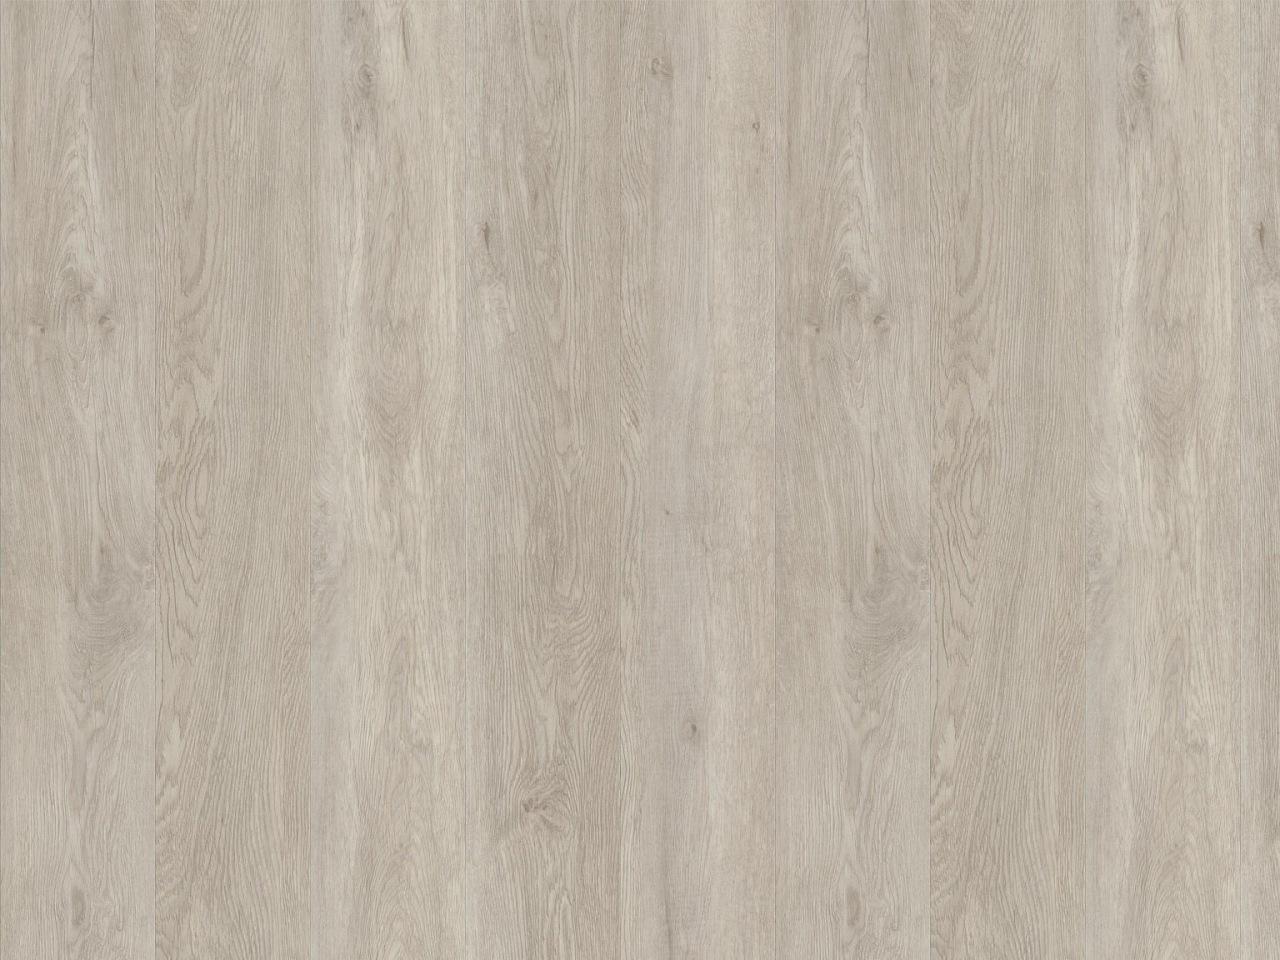 Designbelag Adamo wood – Eiche Namur, 344004